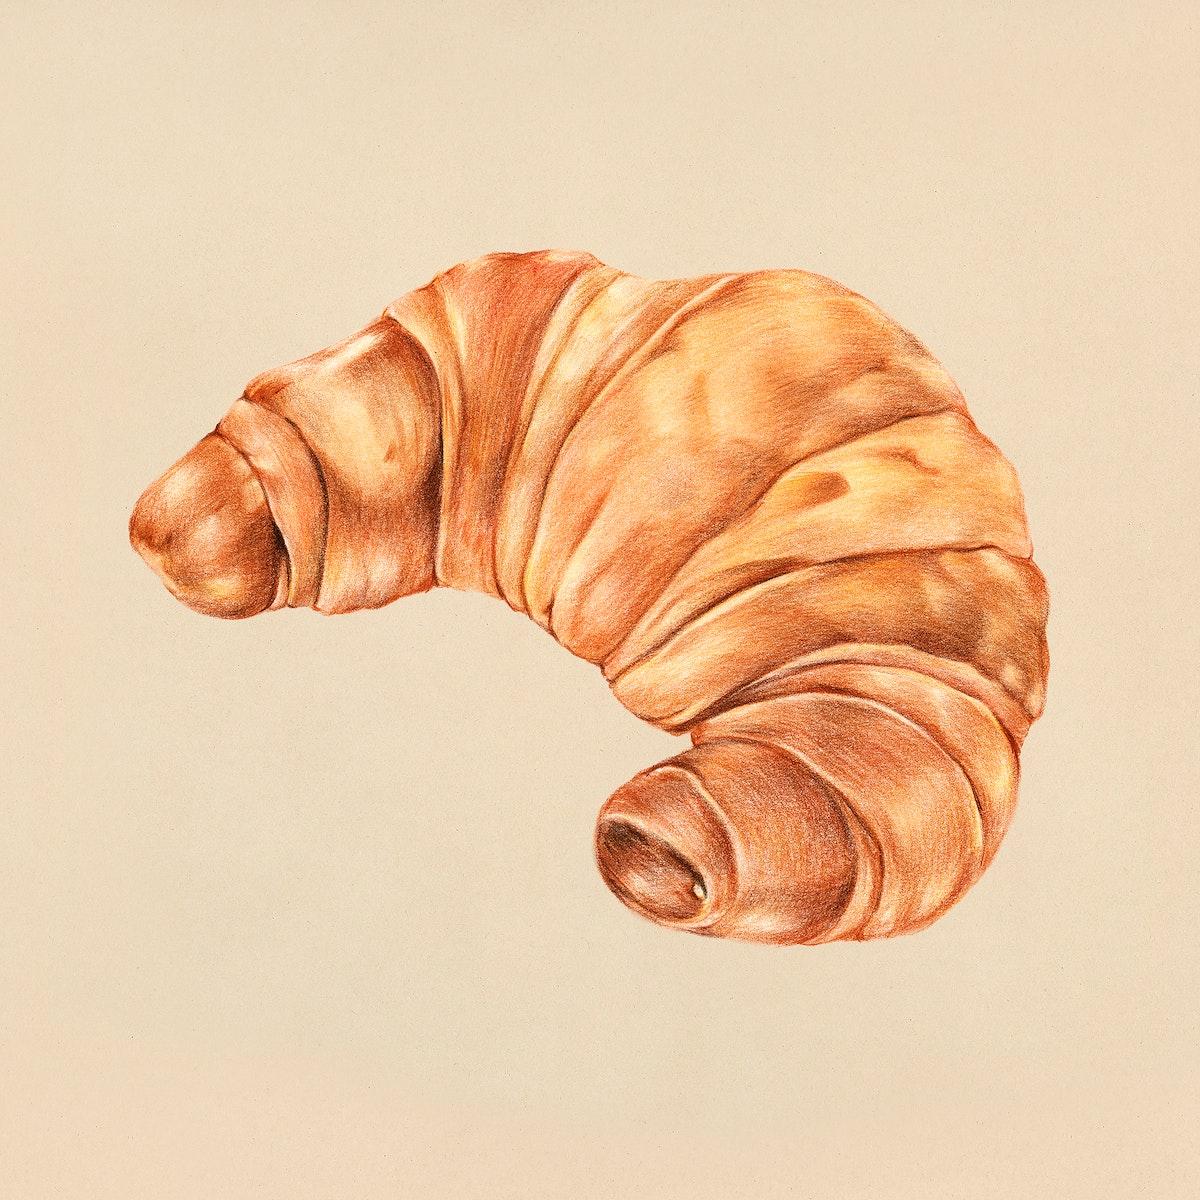 Freshly baked croissant hand-drawn illustration